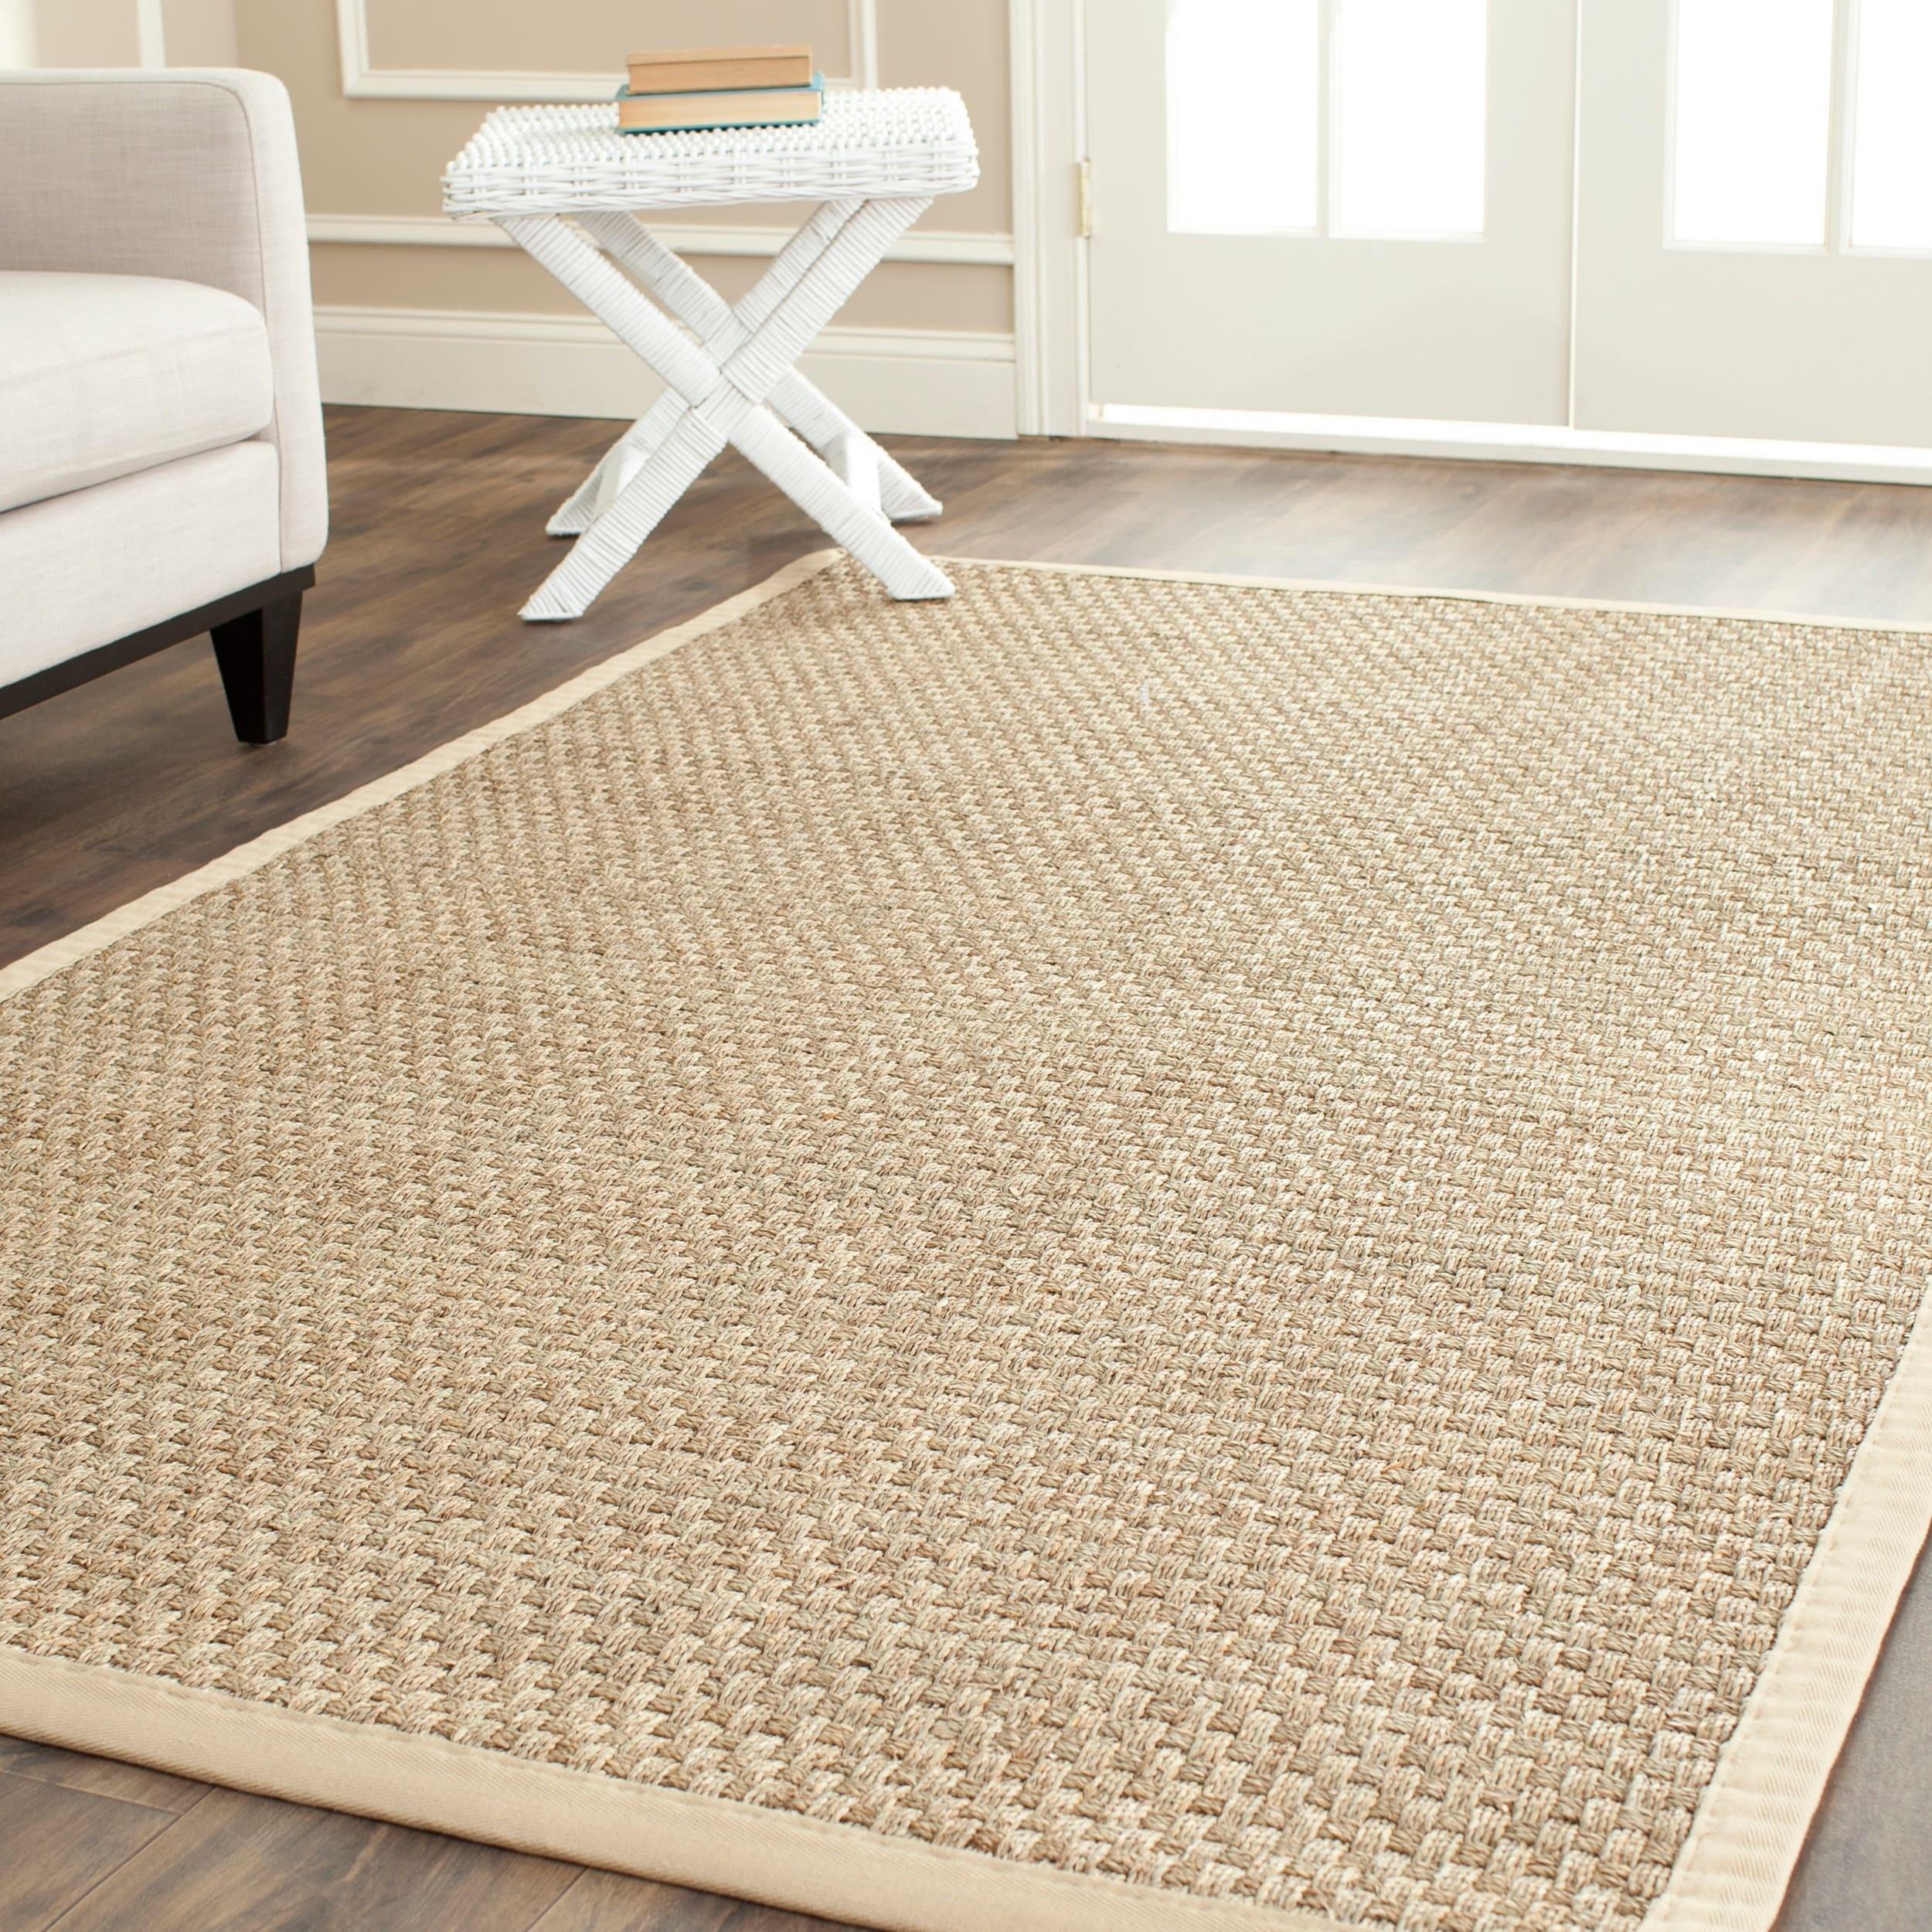 rugs ll you govinda seagrass bamboo rug chocolate area wayfair love ca